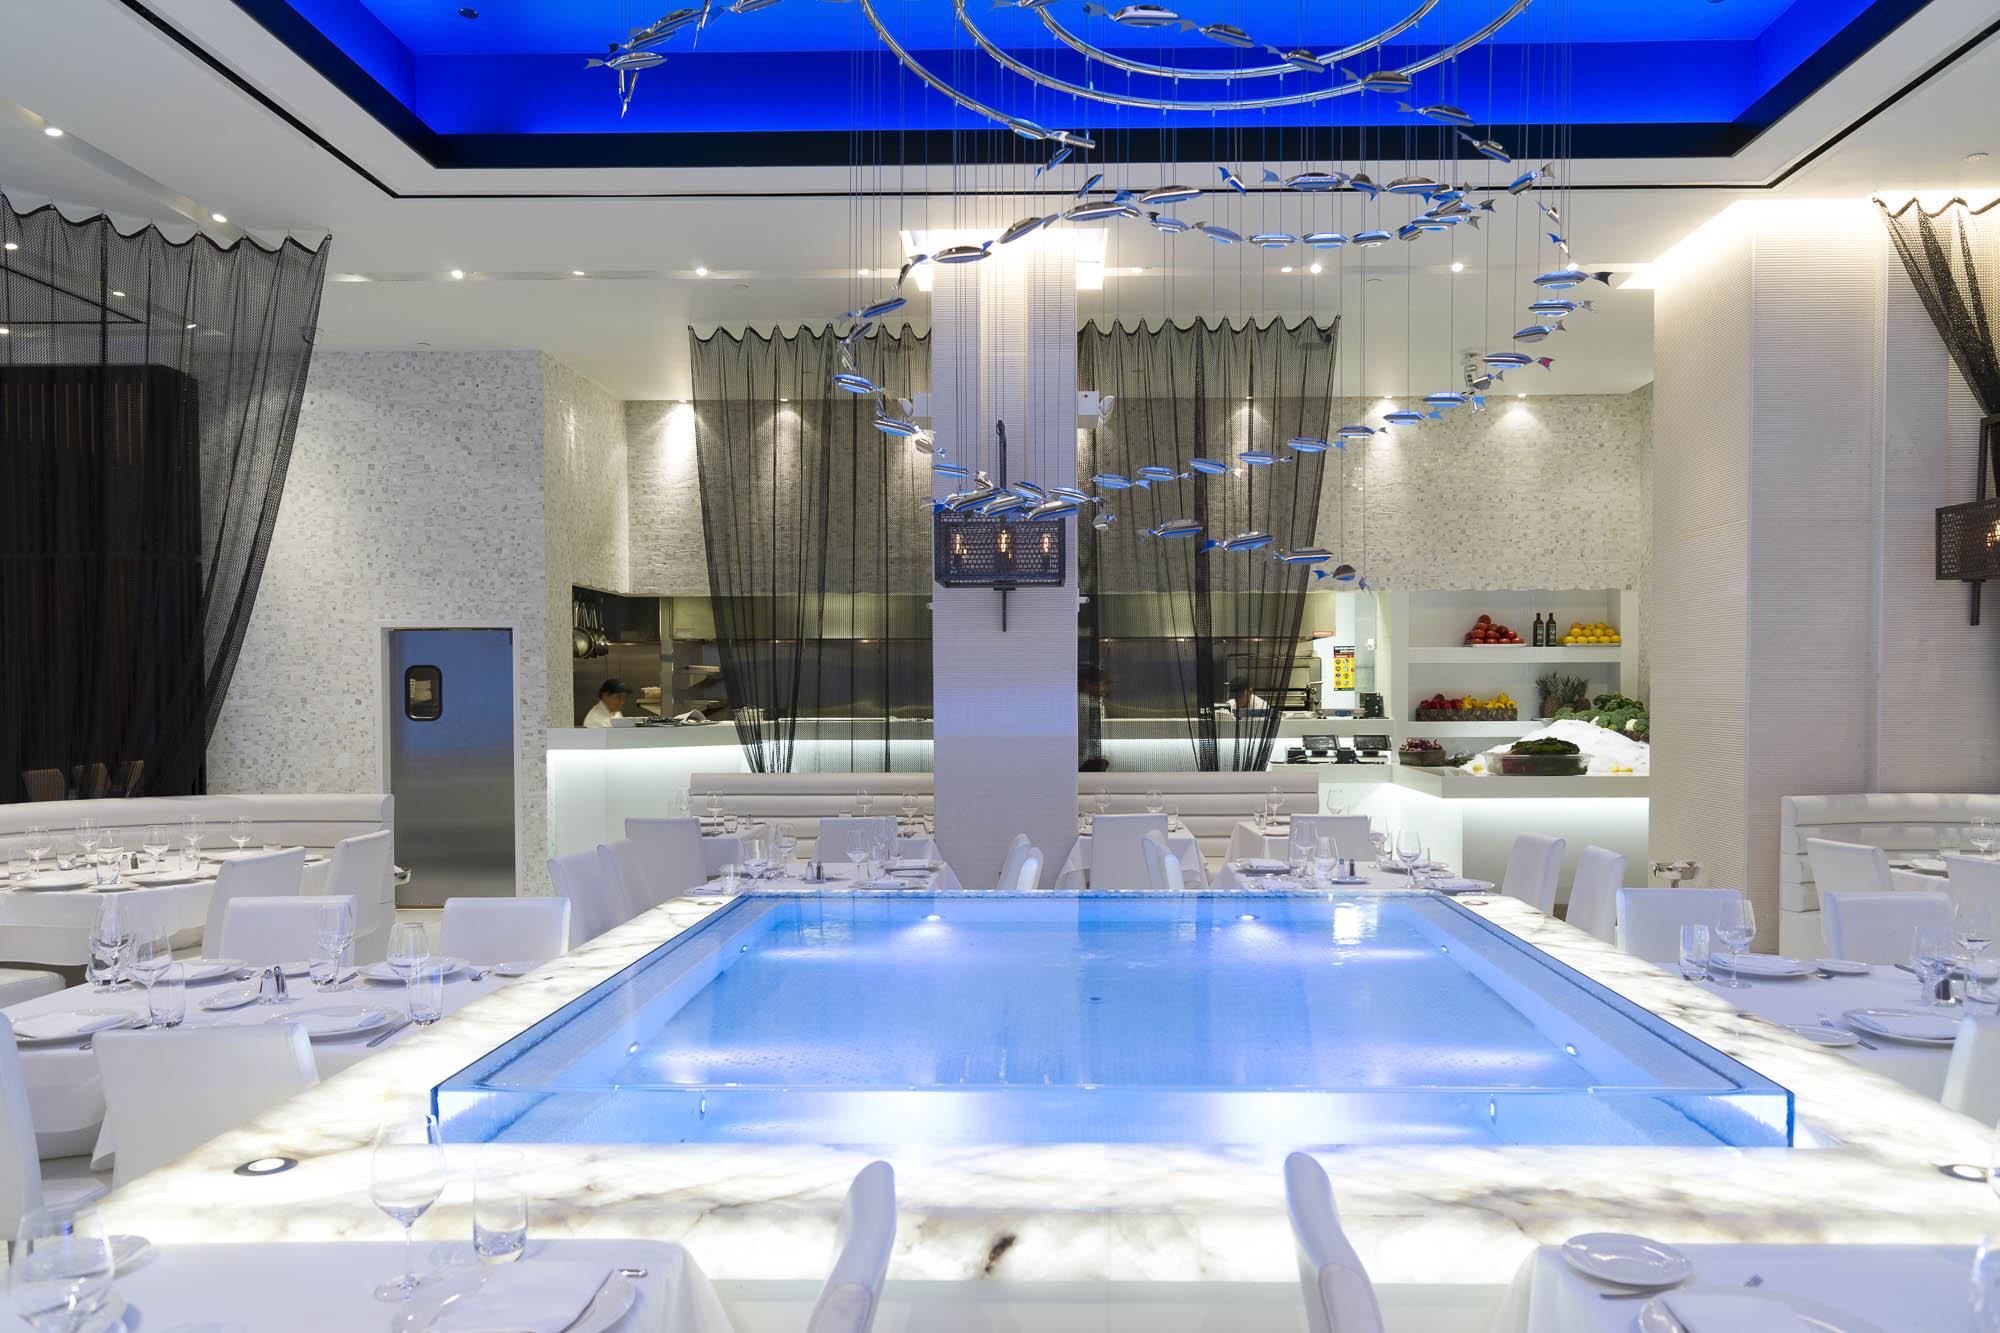 Negative edge reflecting pool at Limani Restaurant, Rockefeller Center, New York City